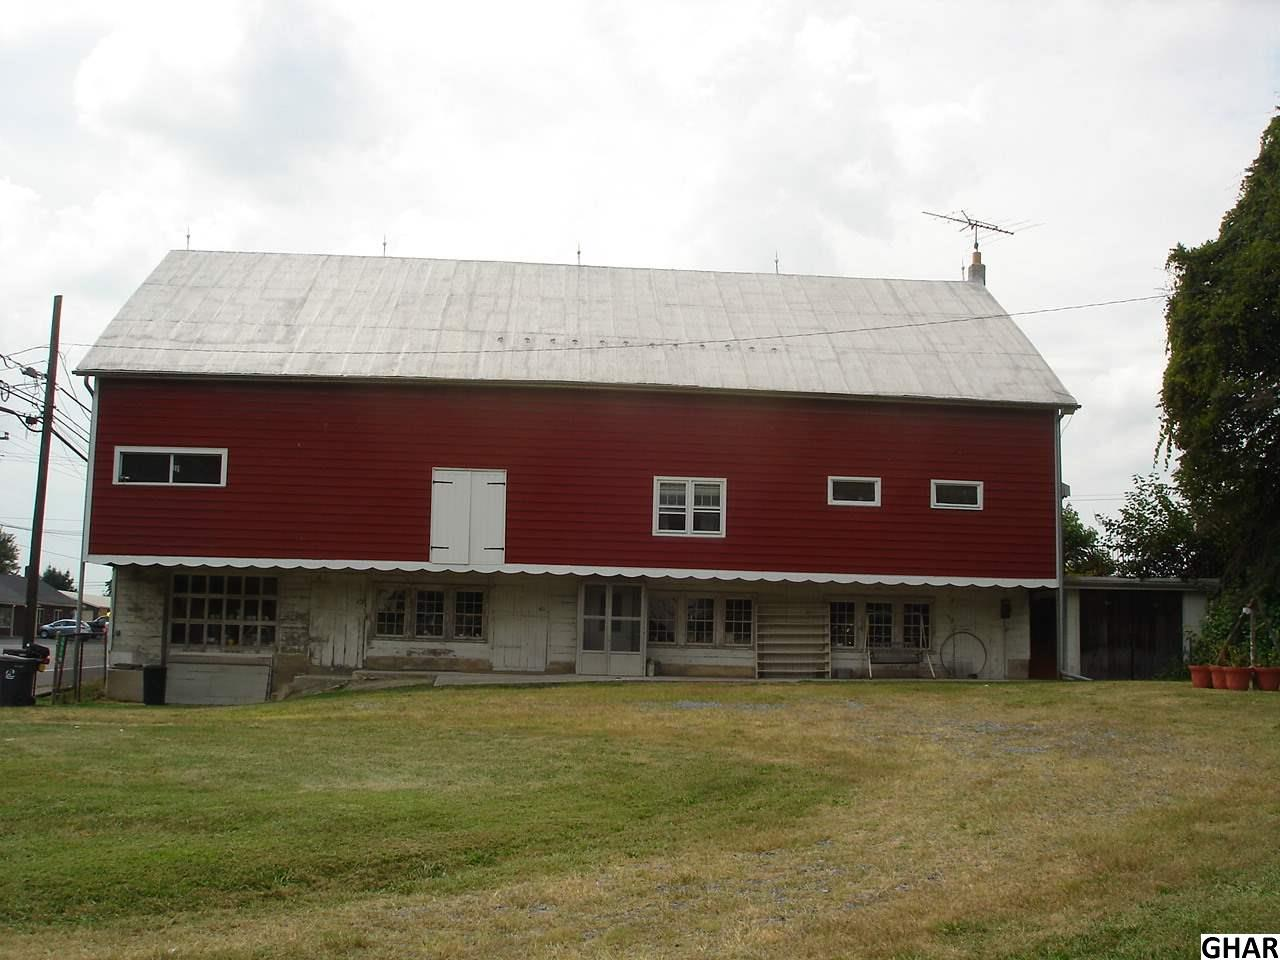 Commercial Property for Sale, ListingId:36316031, location: 1924 York Road Gettysburg 17325